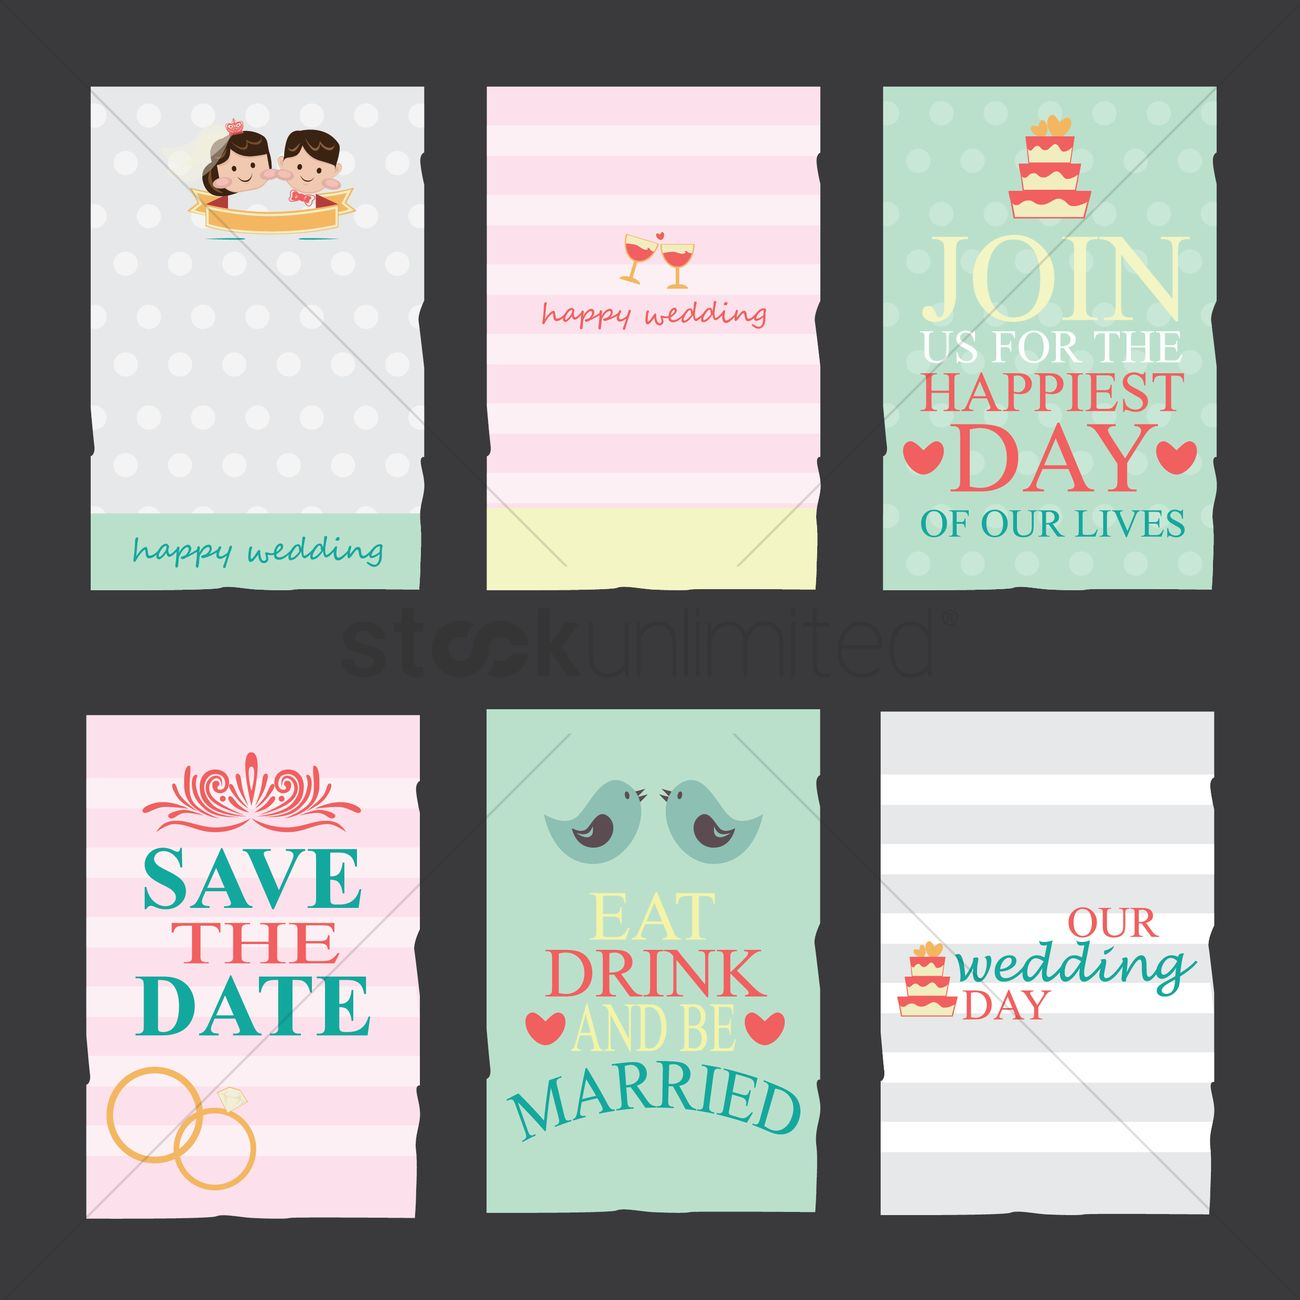 Collection of wedding invitation cards vector image 1799987 collection of wedding invitation cards vector graphic stopboris Gallery